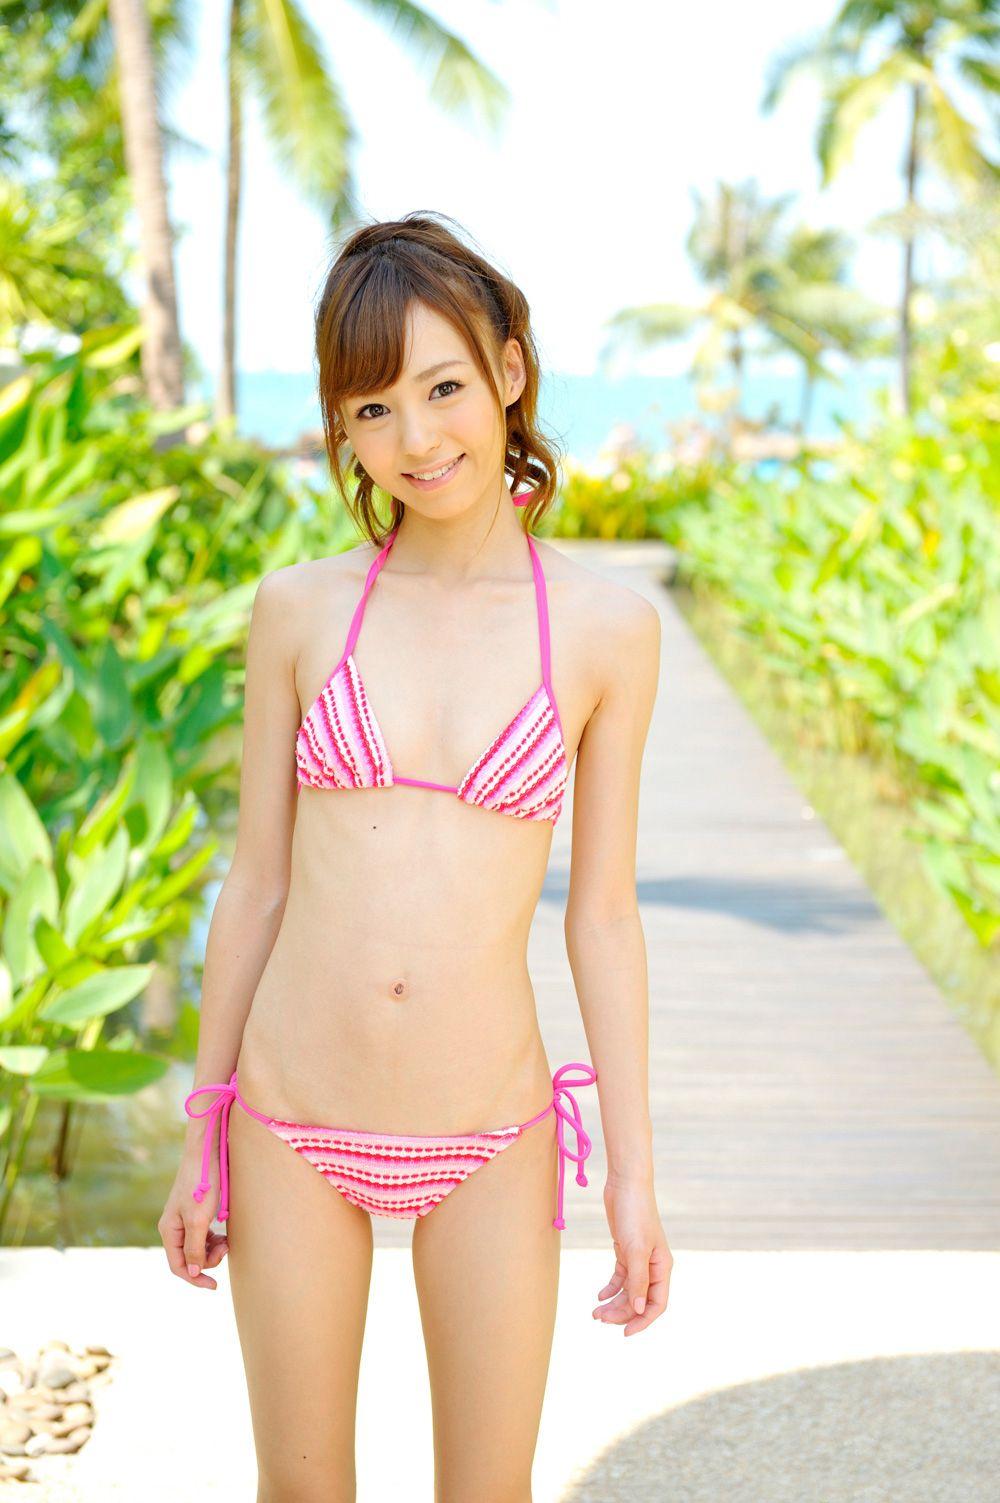 Aino Kishi Mayumi Mask The Kekkou Reborn Asian Best